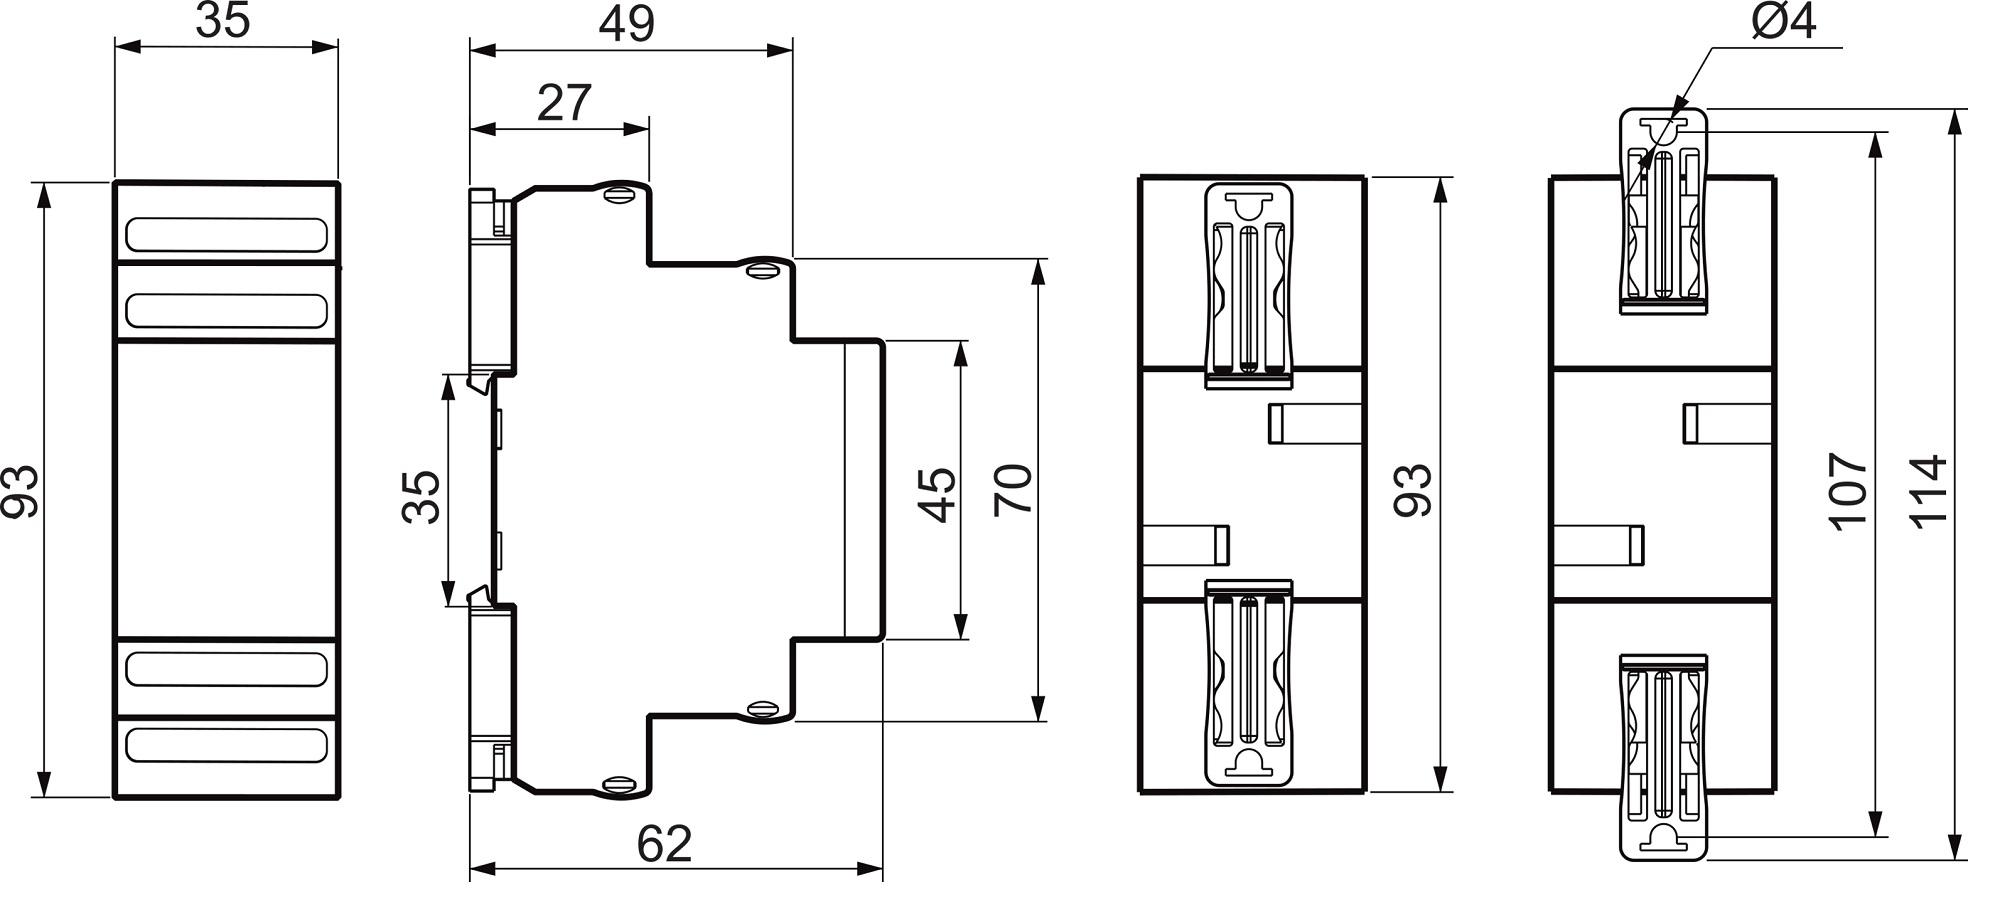 Габаритные размеры РЗН-1М